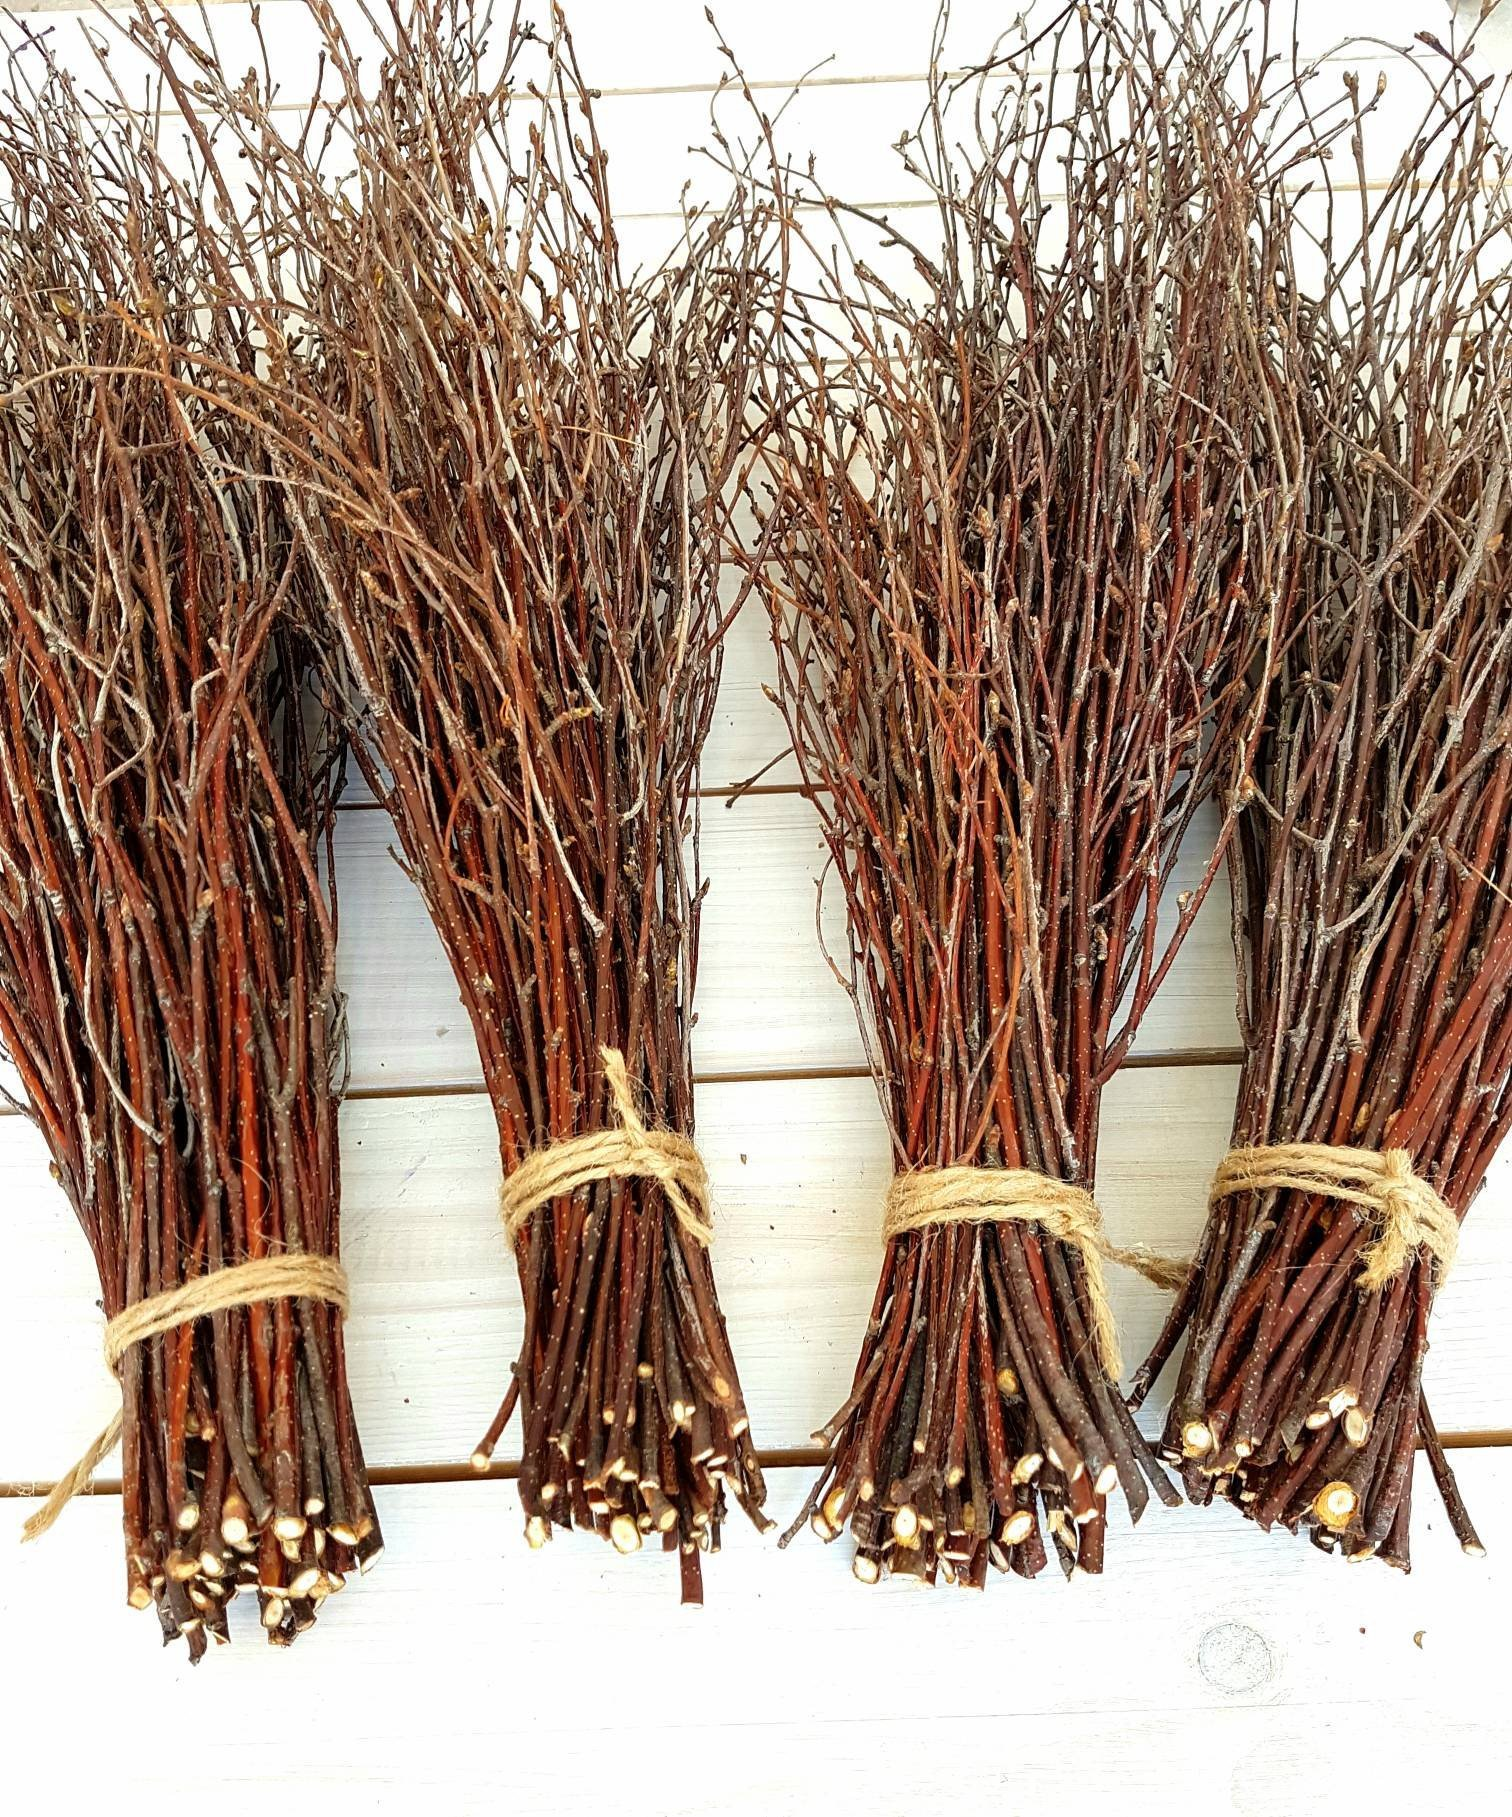 200 pcs. Birch Branches, Natural Birch Twigs, Birch Branches centerpieces, Decorative Birch, Birch Branches for Crafts, Set of 4 Bundles